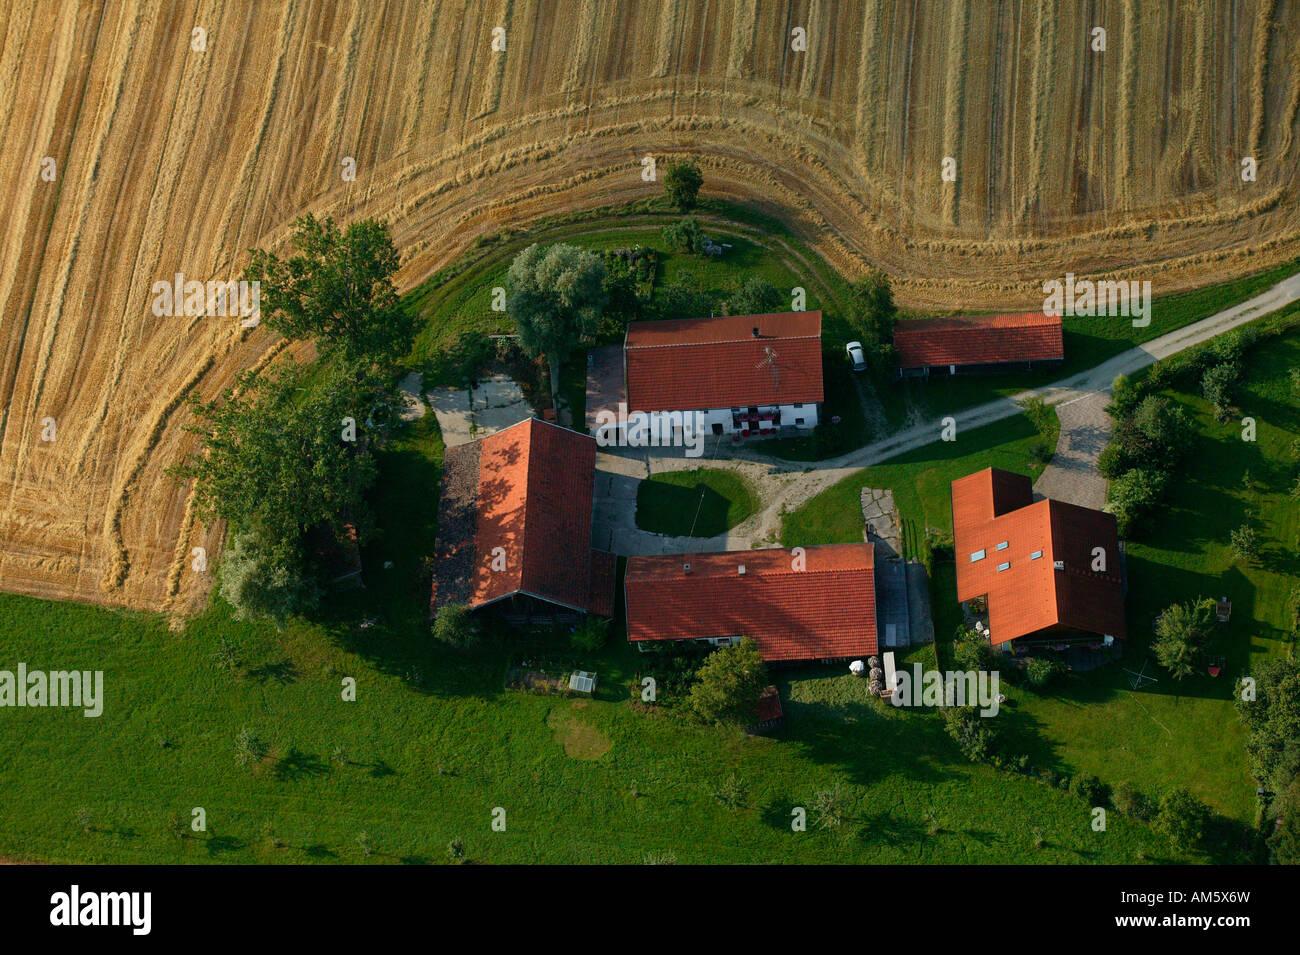 Farm between harvested grainfields, Lower Bavaria, Bavaria, Germany Stock Photo